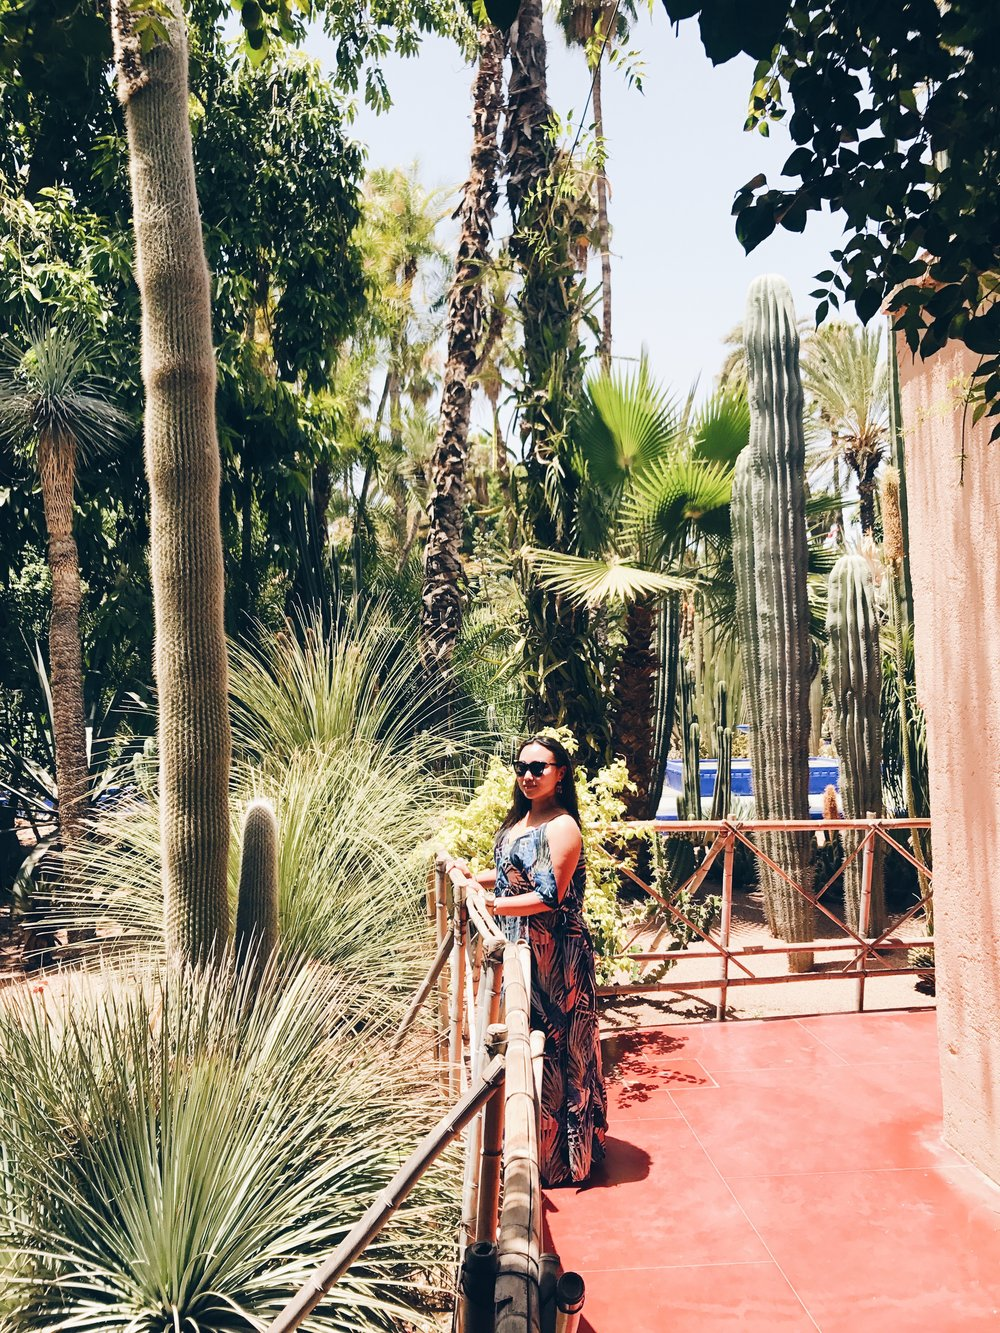 Le Jardin Majorelle in Morocco